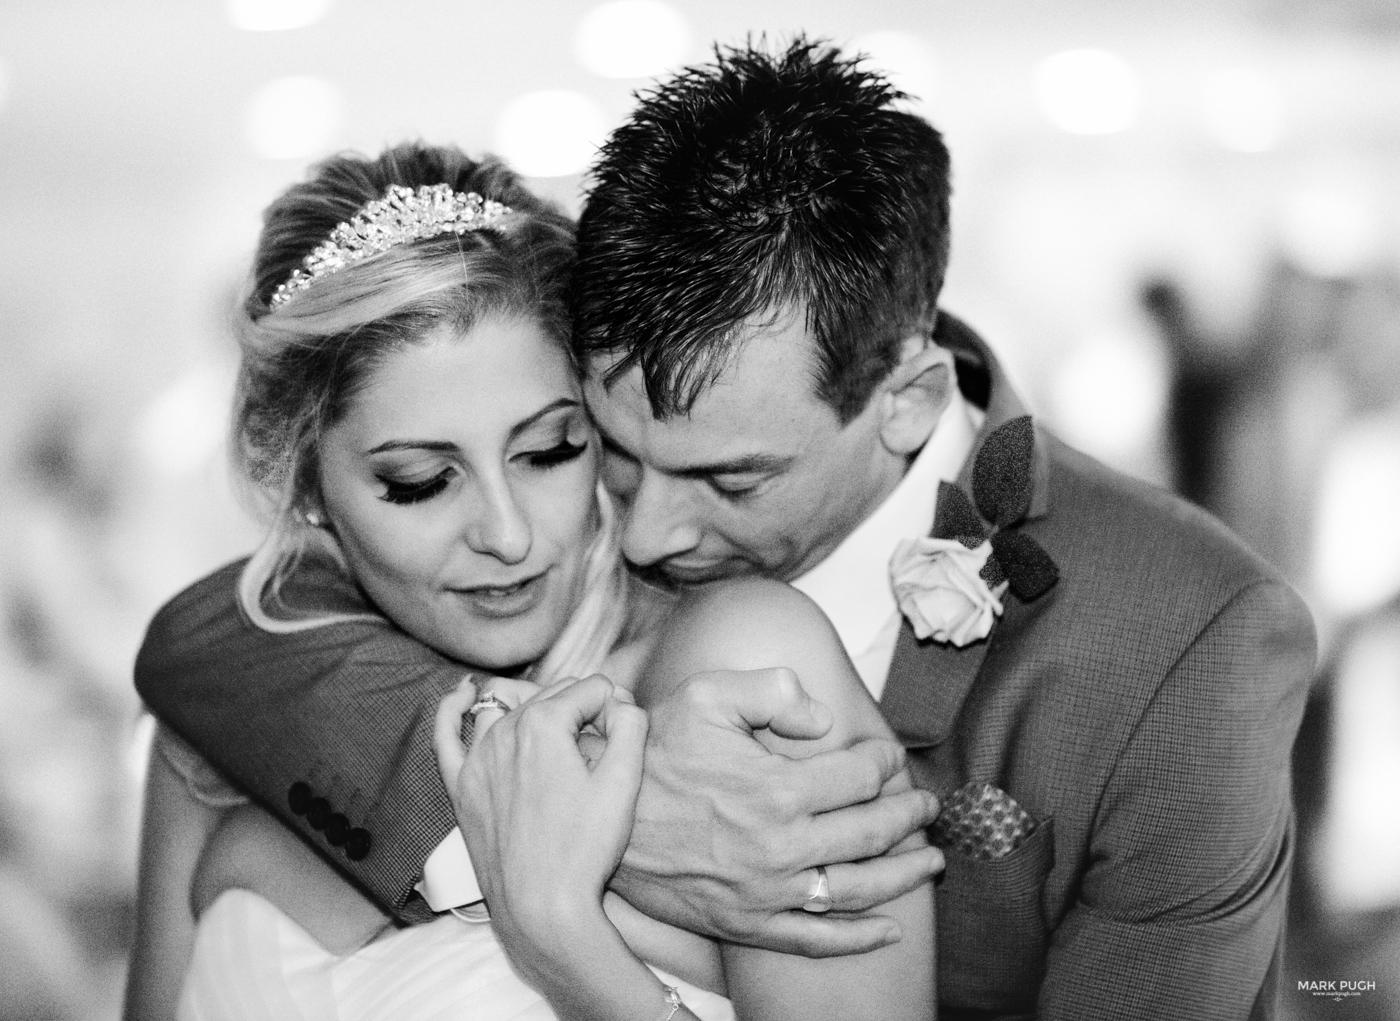 197 Wedding Photography Award winning Wedding Photographer and Videographer Mark Pugh www.markpugh.com.JPG